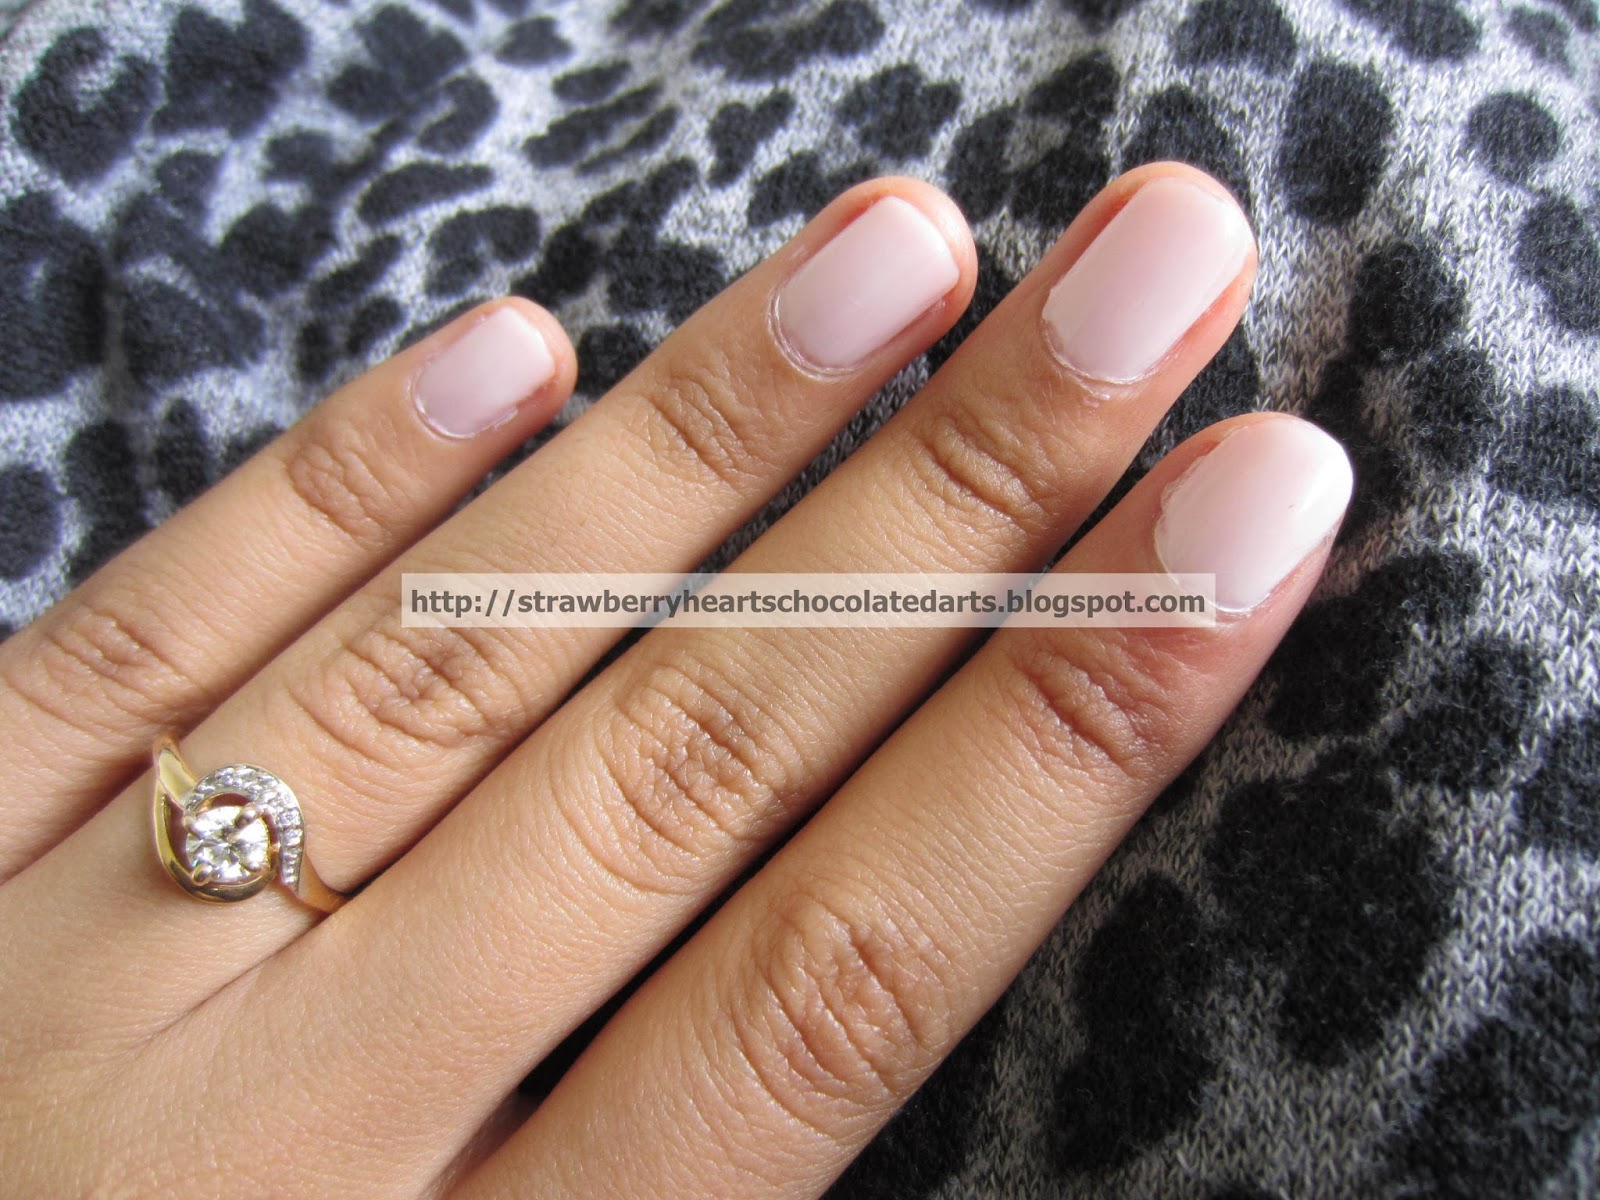 strawberry hearts chocolate darts lacquer love essie nail polish